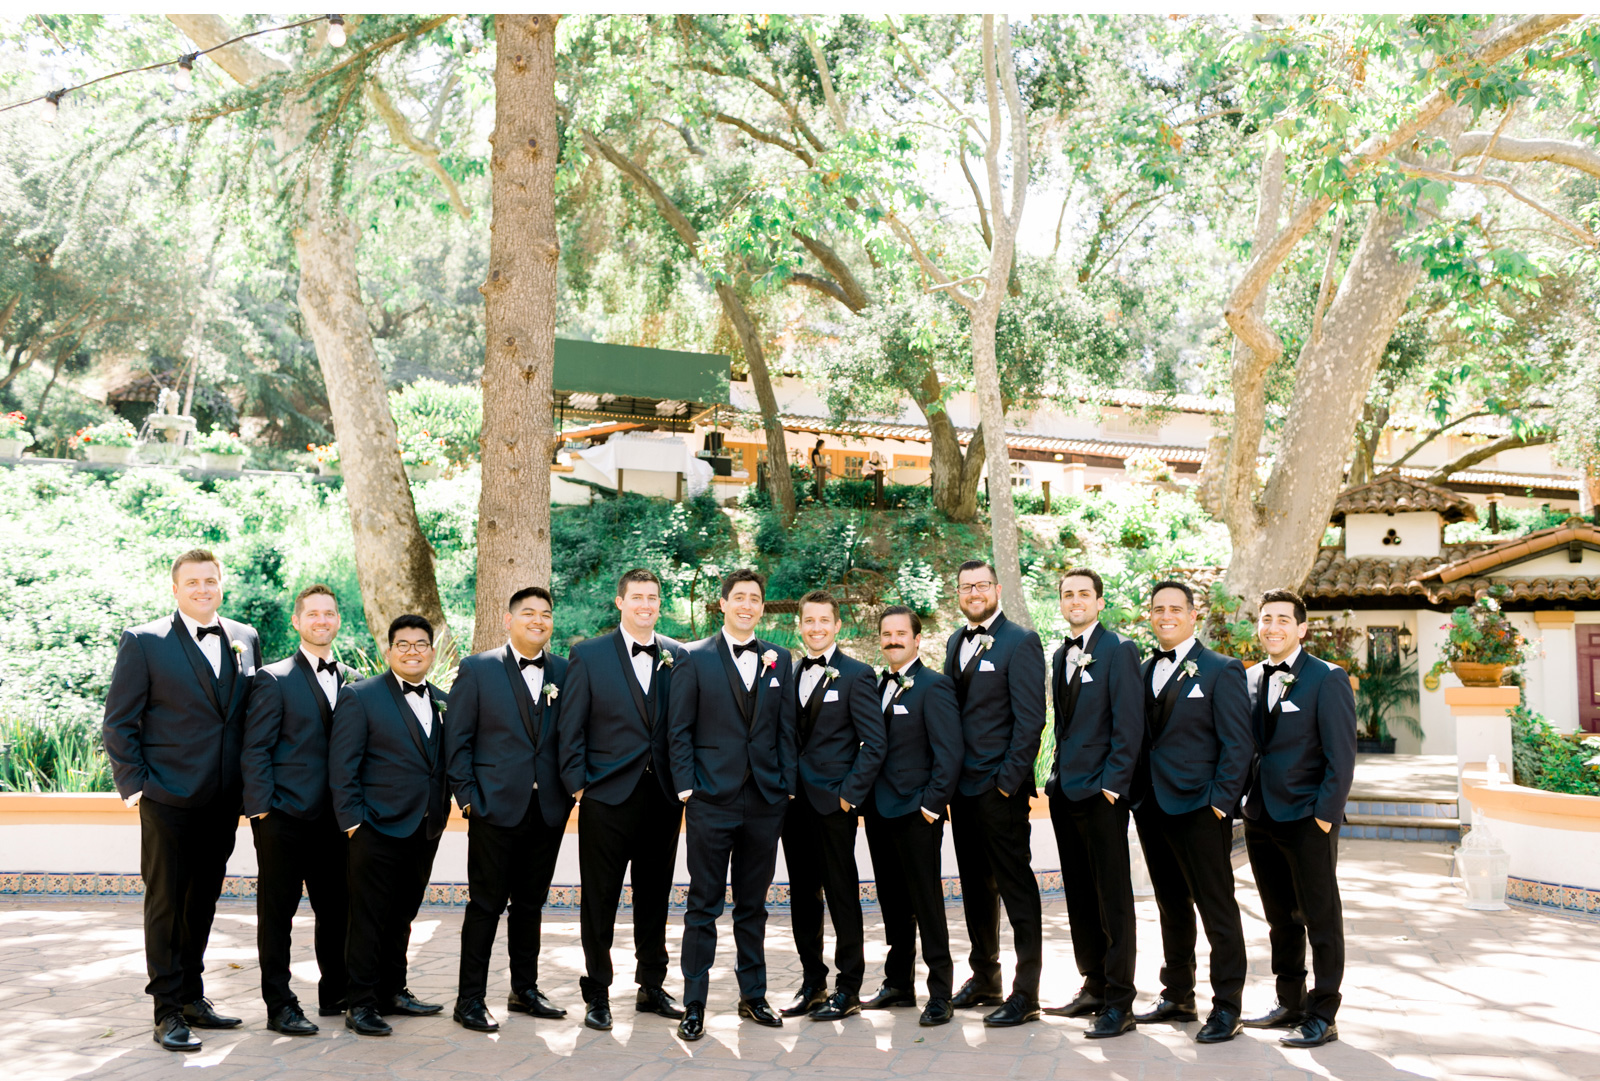 Rancho-Las-Lomas-Style-Me-Pretty-Wedding-Natalie-Schutt-Photography_06.jpg